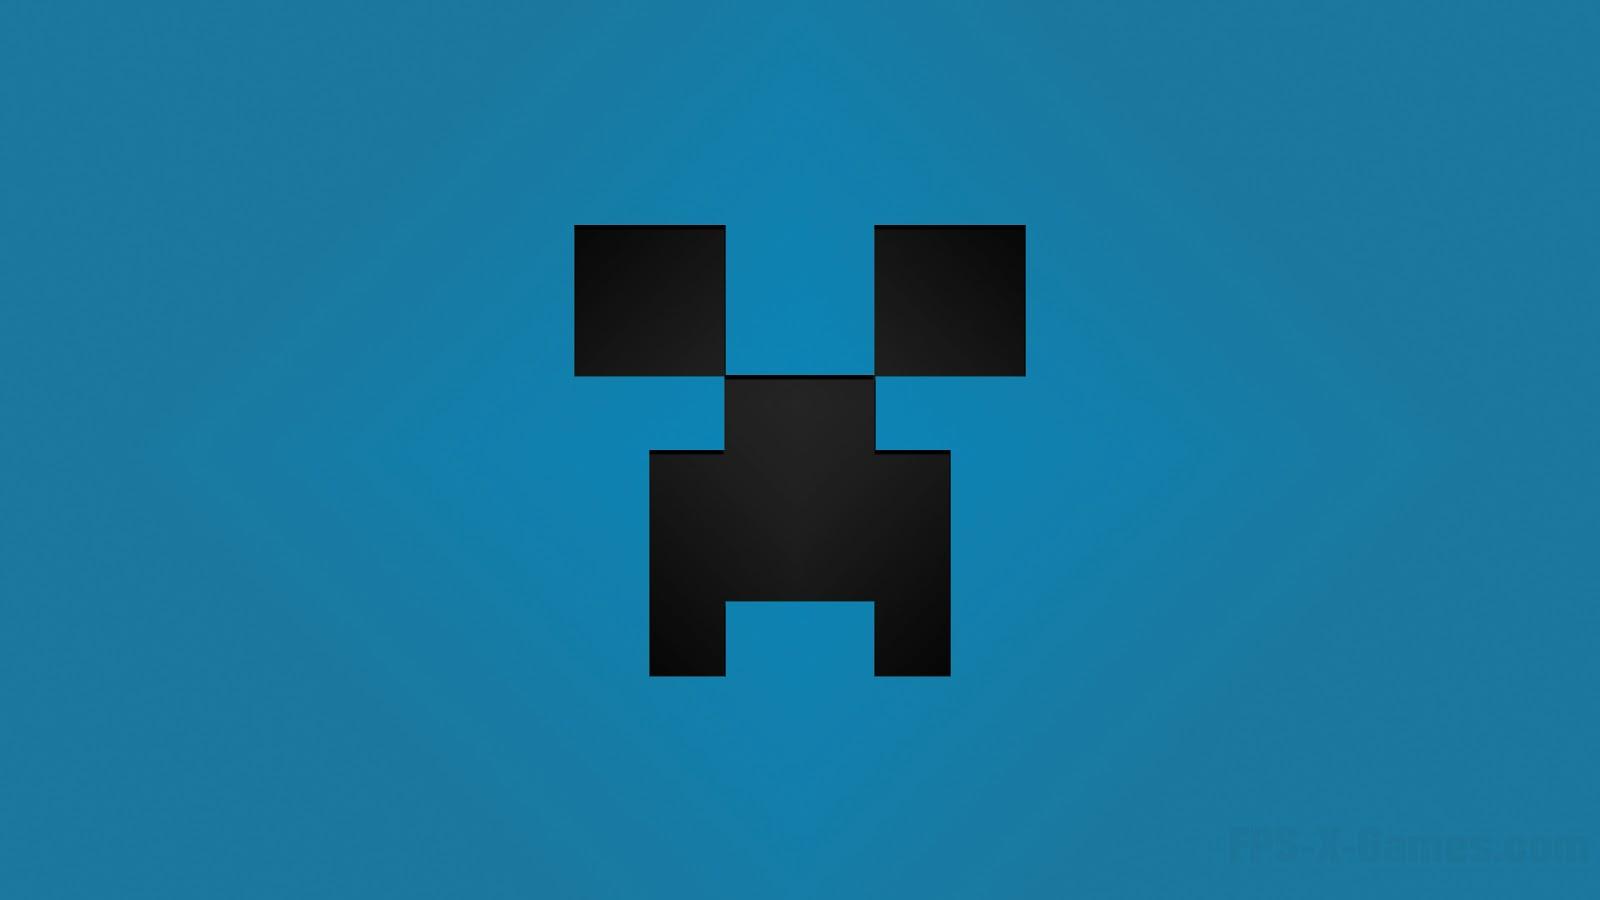 Minecraft Creeper Desktop Wallpapers Blue